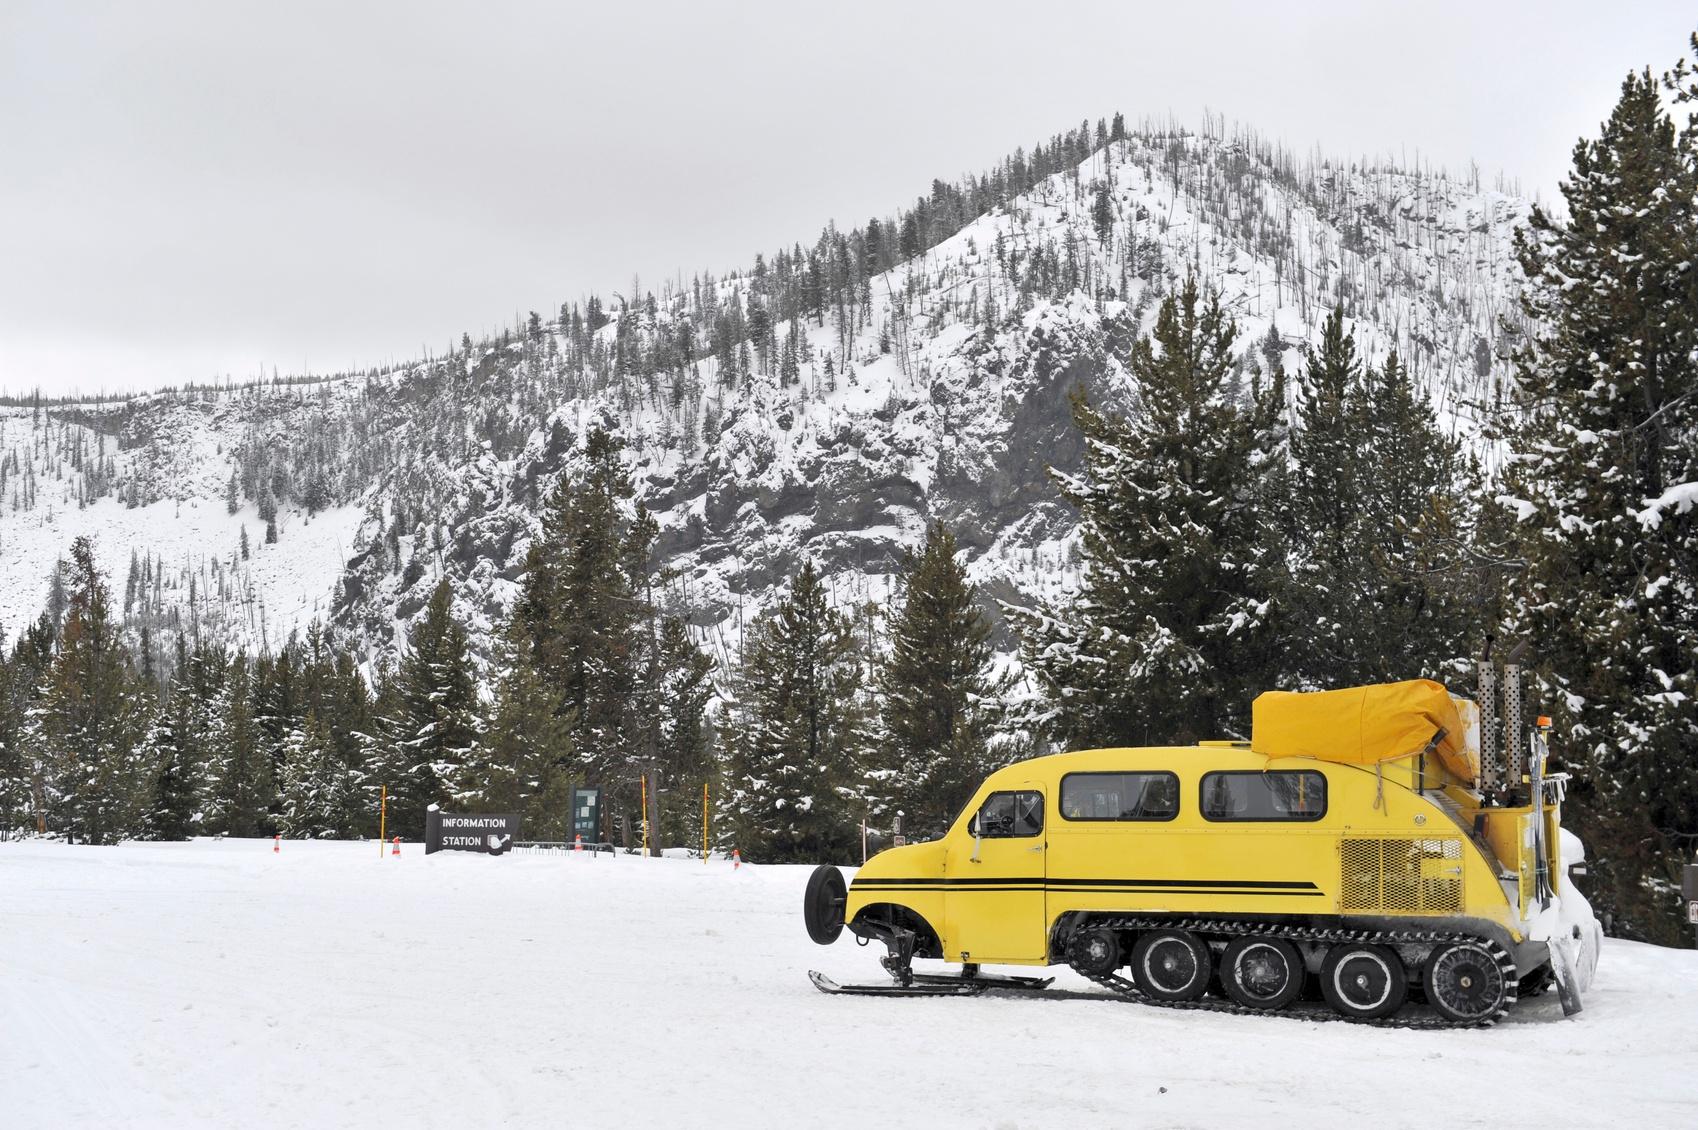 Winter photos of Yellowstone National Park